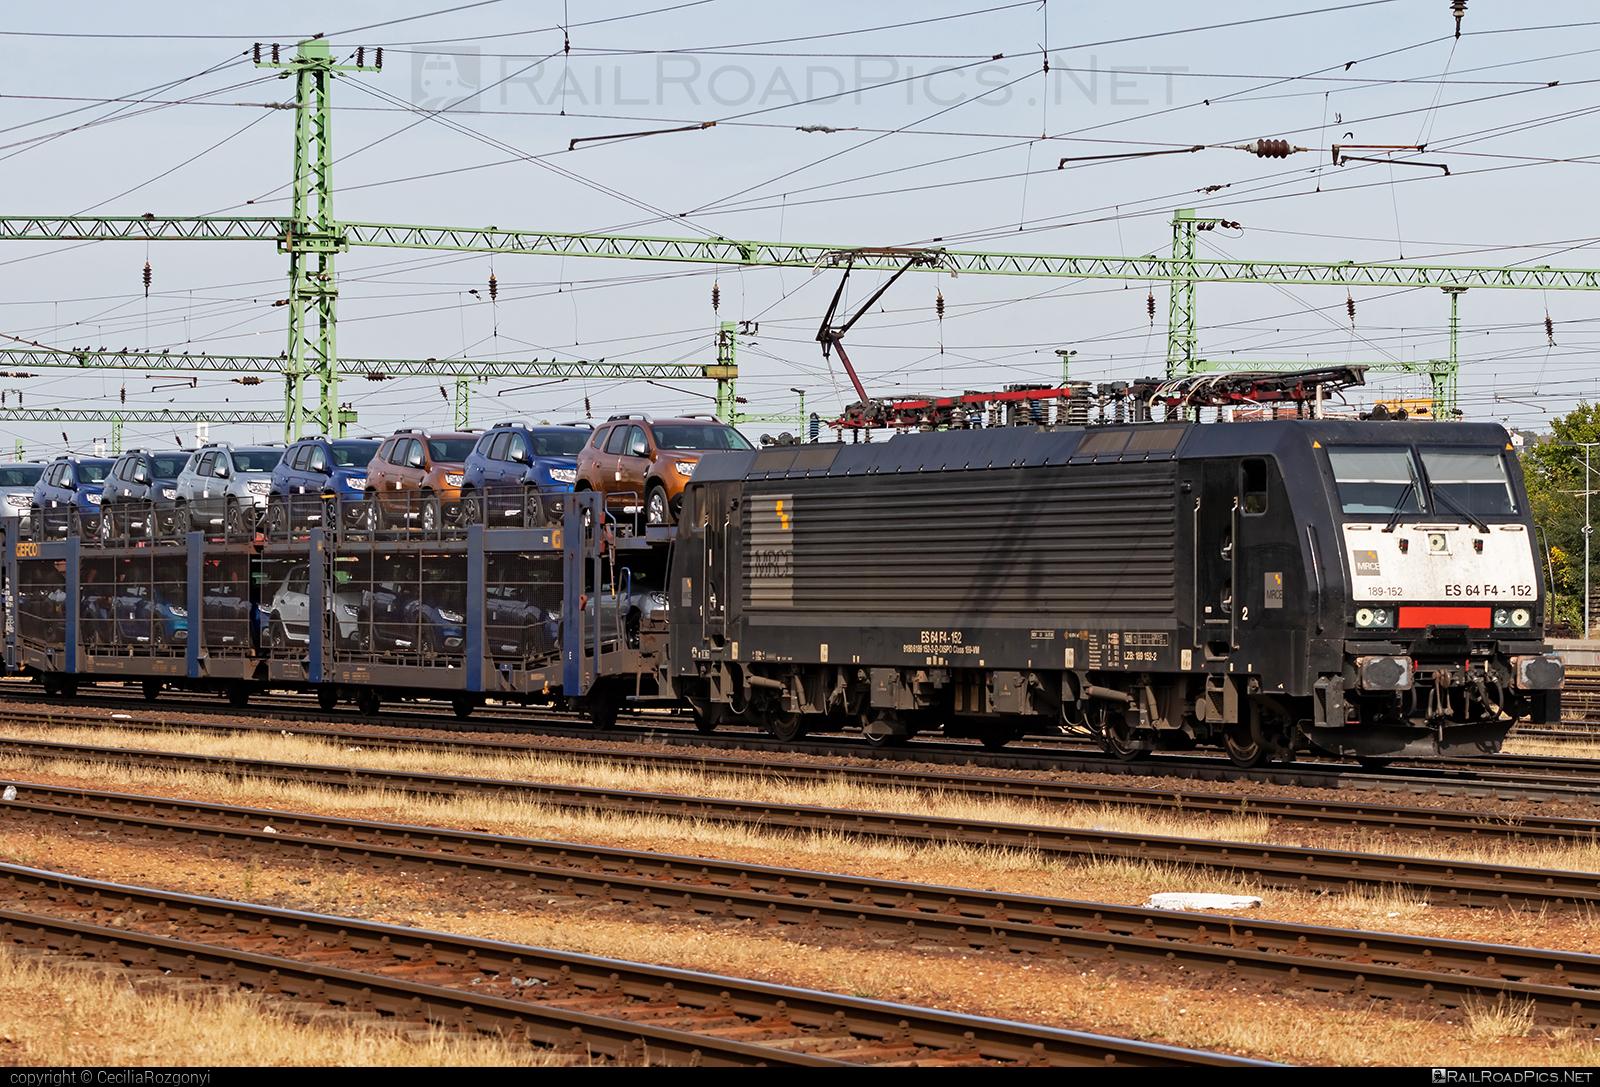 Siemens ES 64 F4 - 189 152-2 operated by Retrack Slovakia s. r. o. #carcarrierwagon #dispolok #es64 #es64f4 #eurosprinter #gefco #mitsuirailcapitaleurope #mitsuirailcapitaleuropegmbh #mrce #retrack #retrackslovakia #siemens #siemenses64 #siemenses64f4